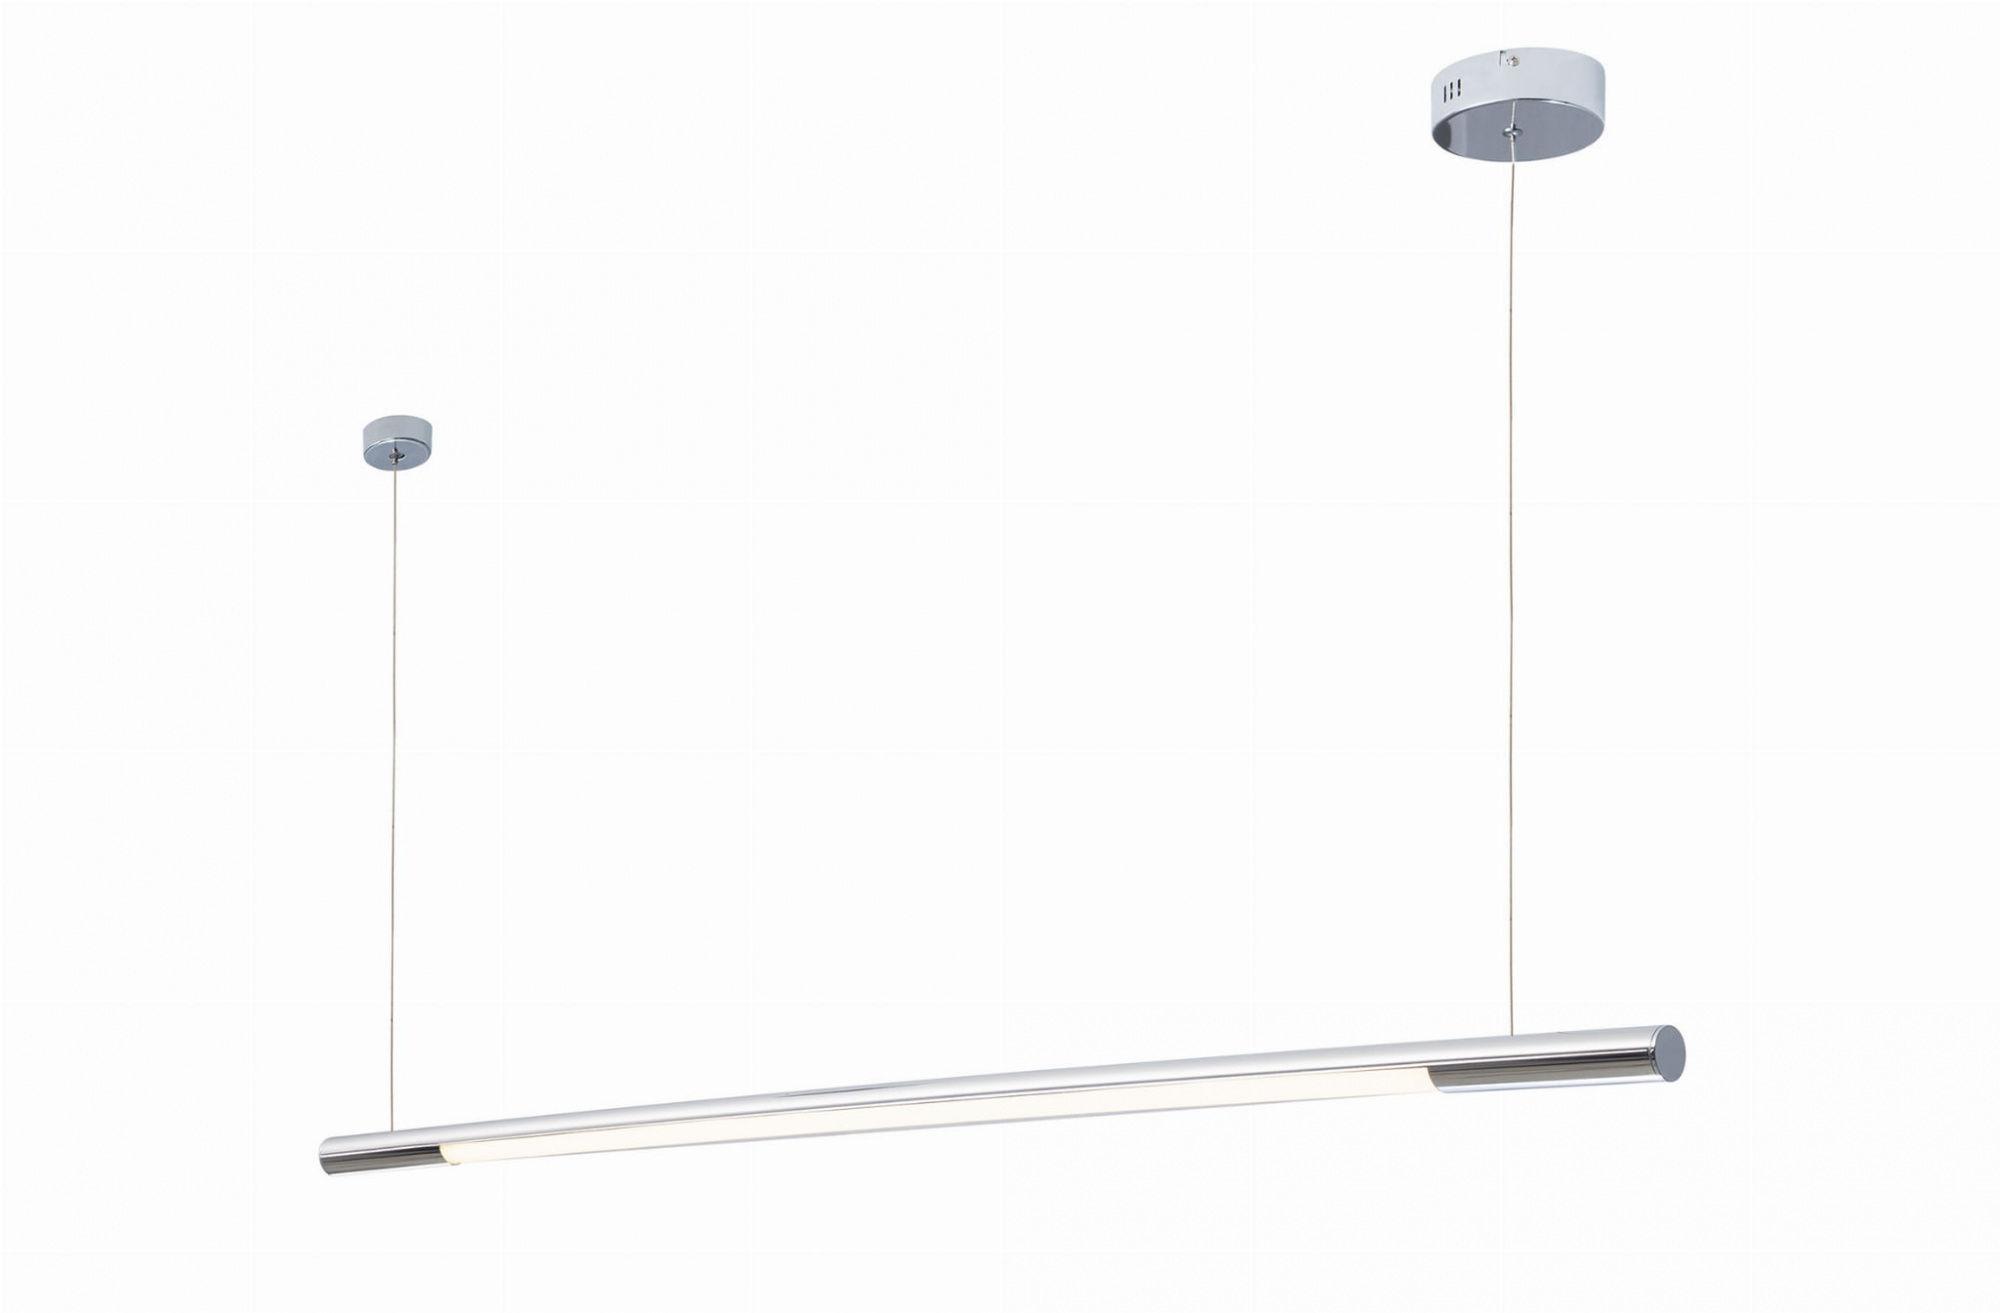 Lampa wisząca Organic Horizon P0359 Maxlight pojedyncza chromowa oprawa sufitowa